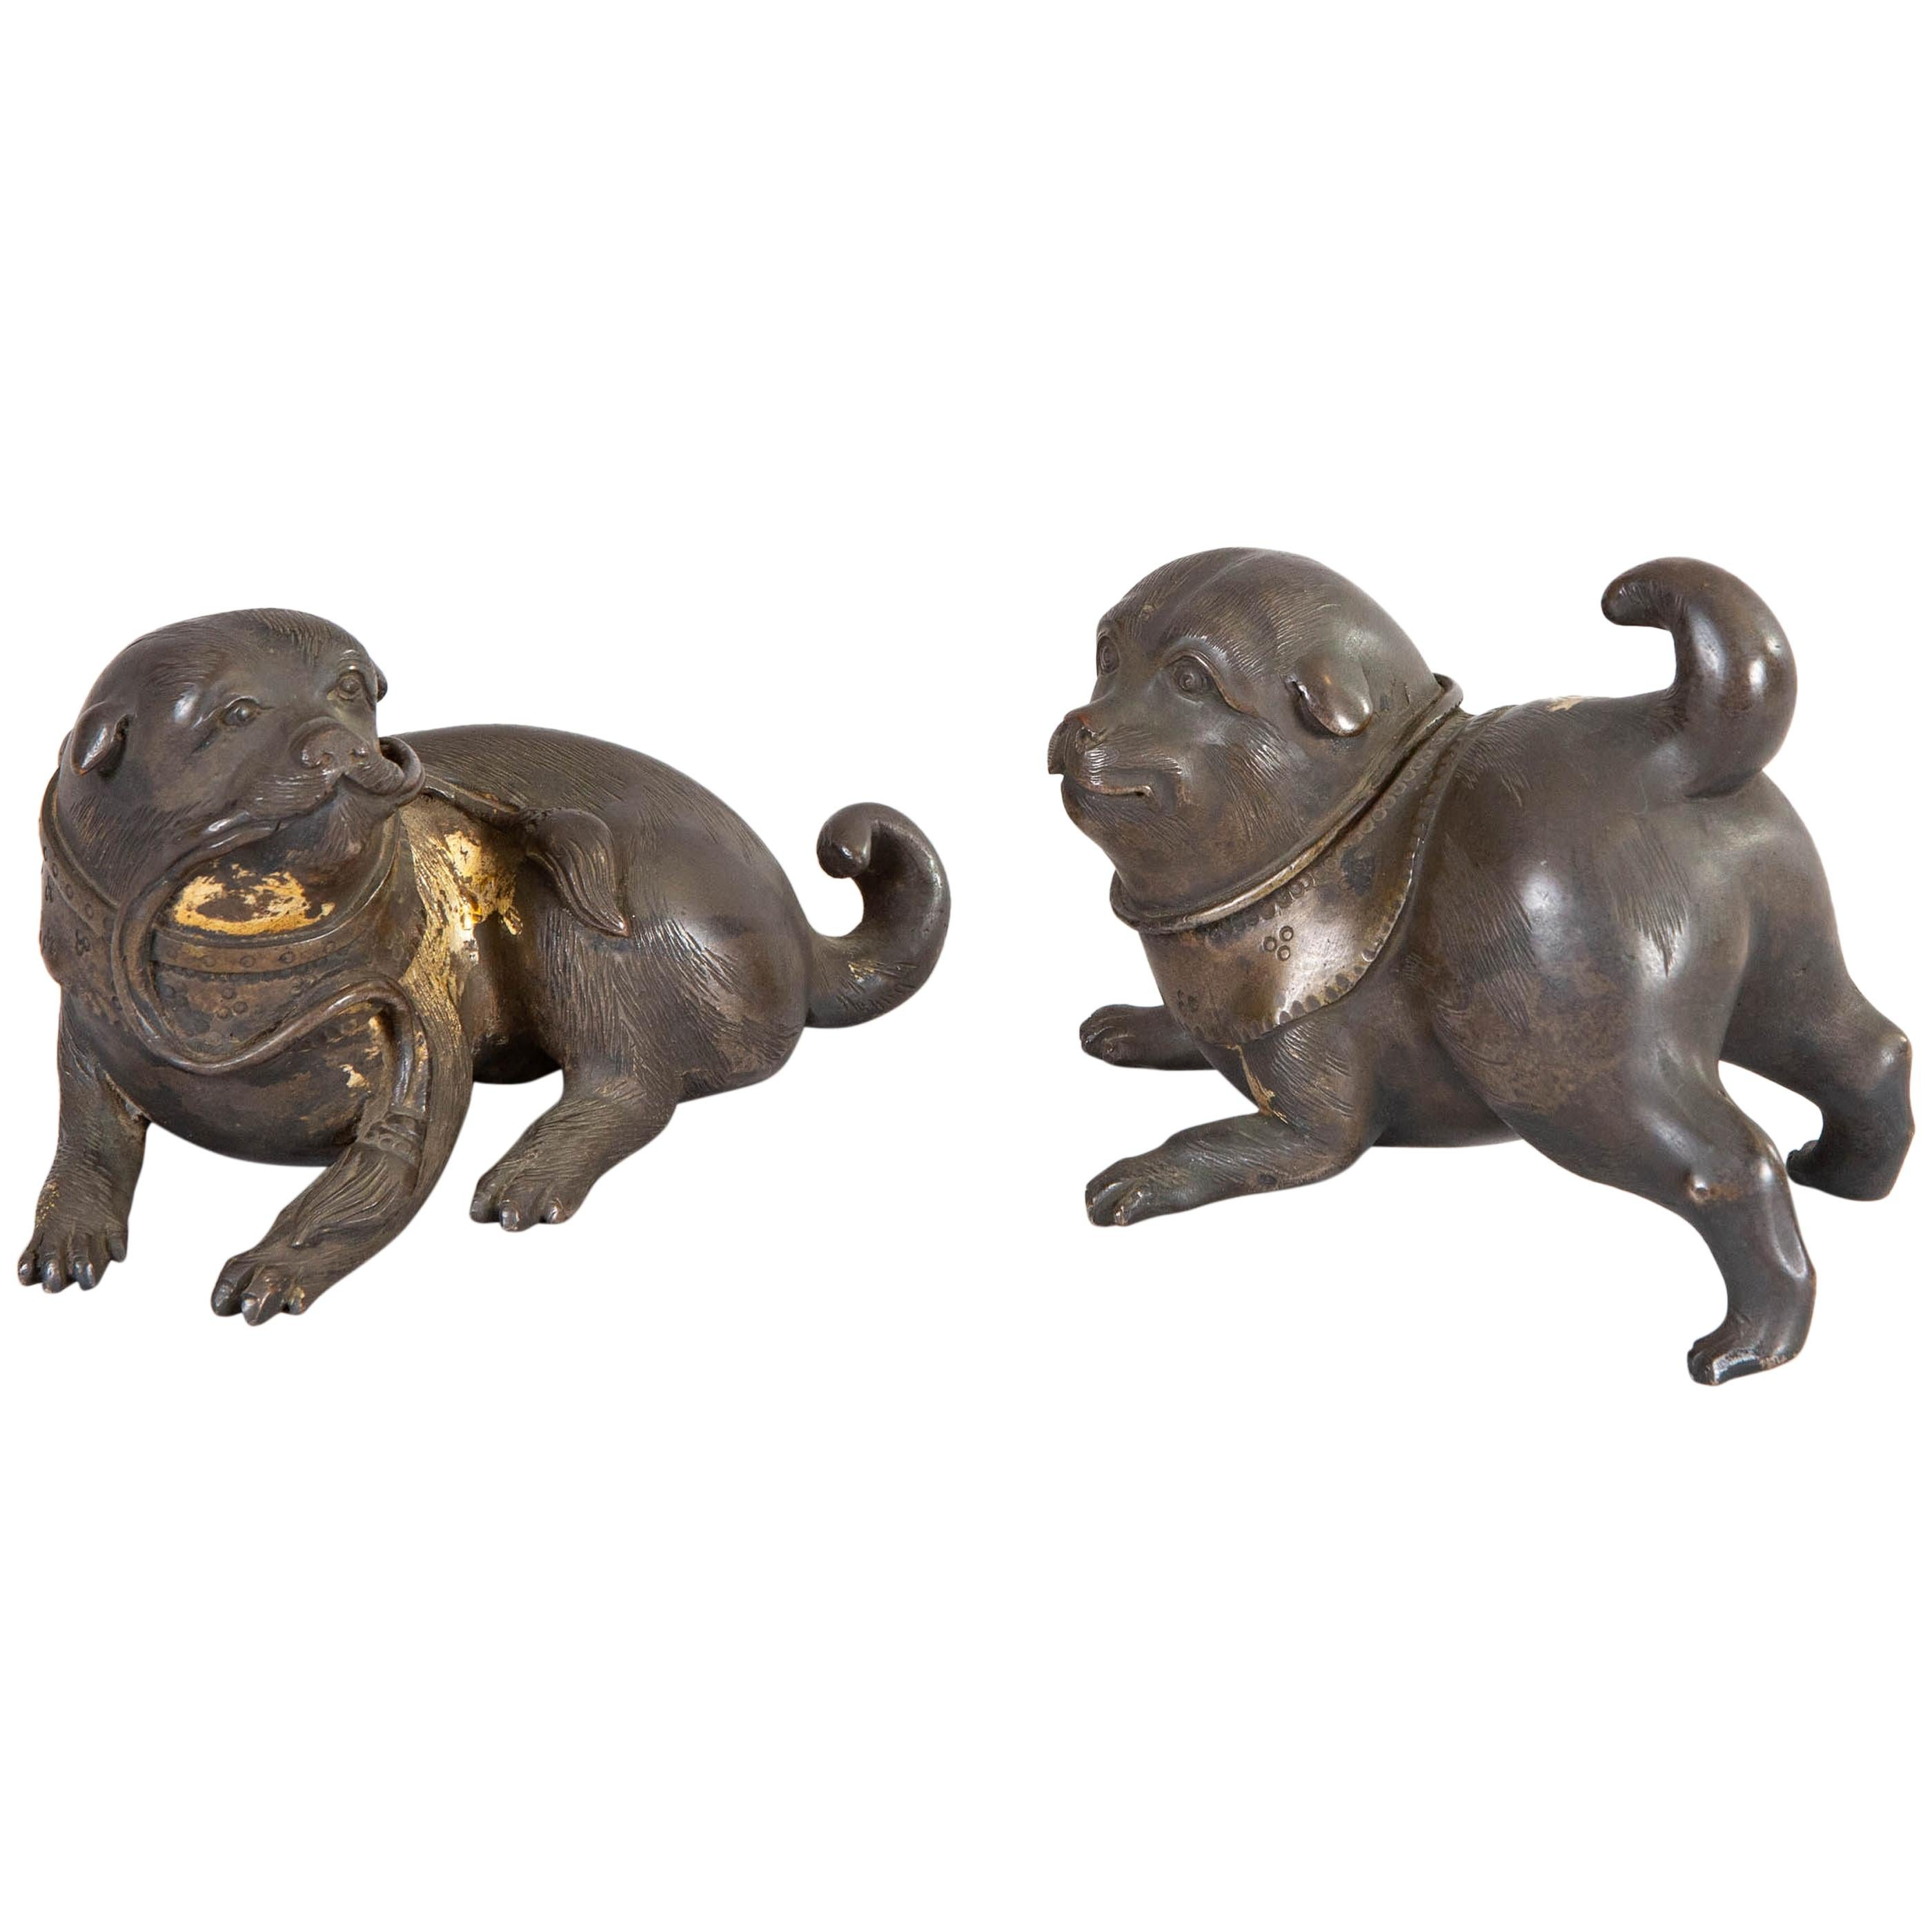 Pair of 19th Century Japanese Bronze Playful Puppies